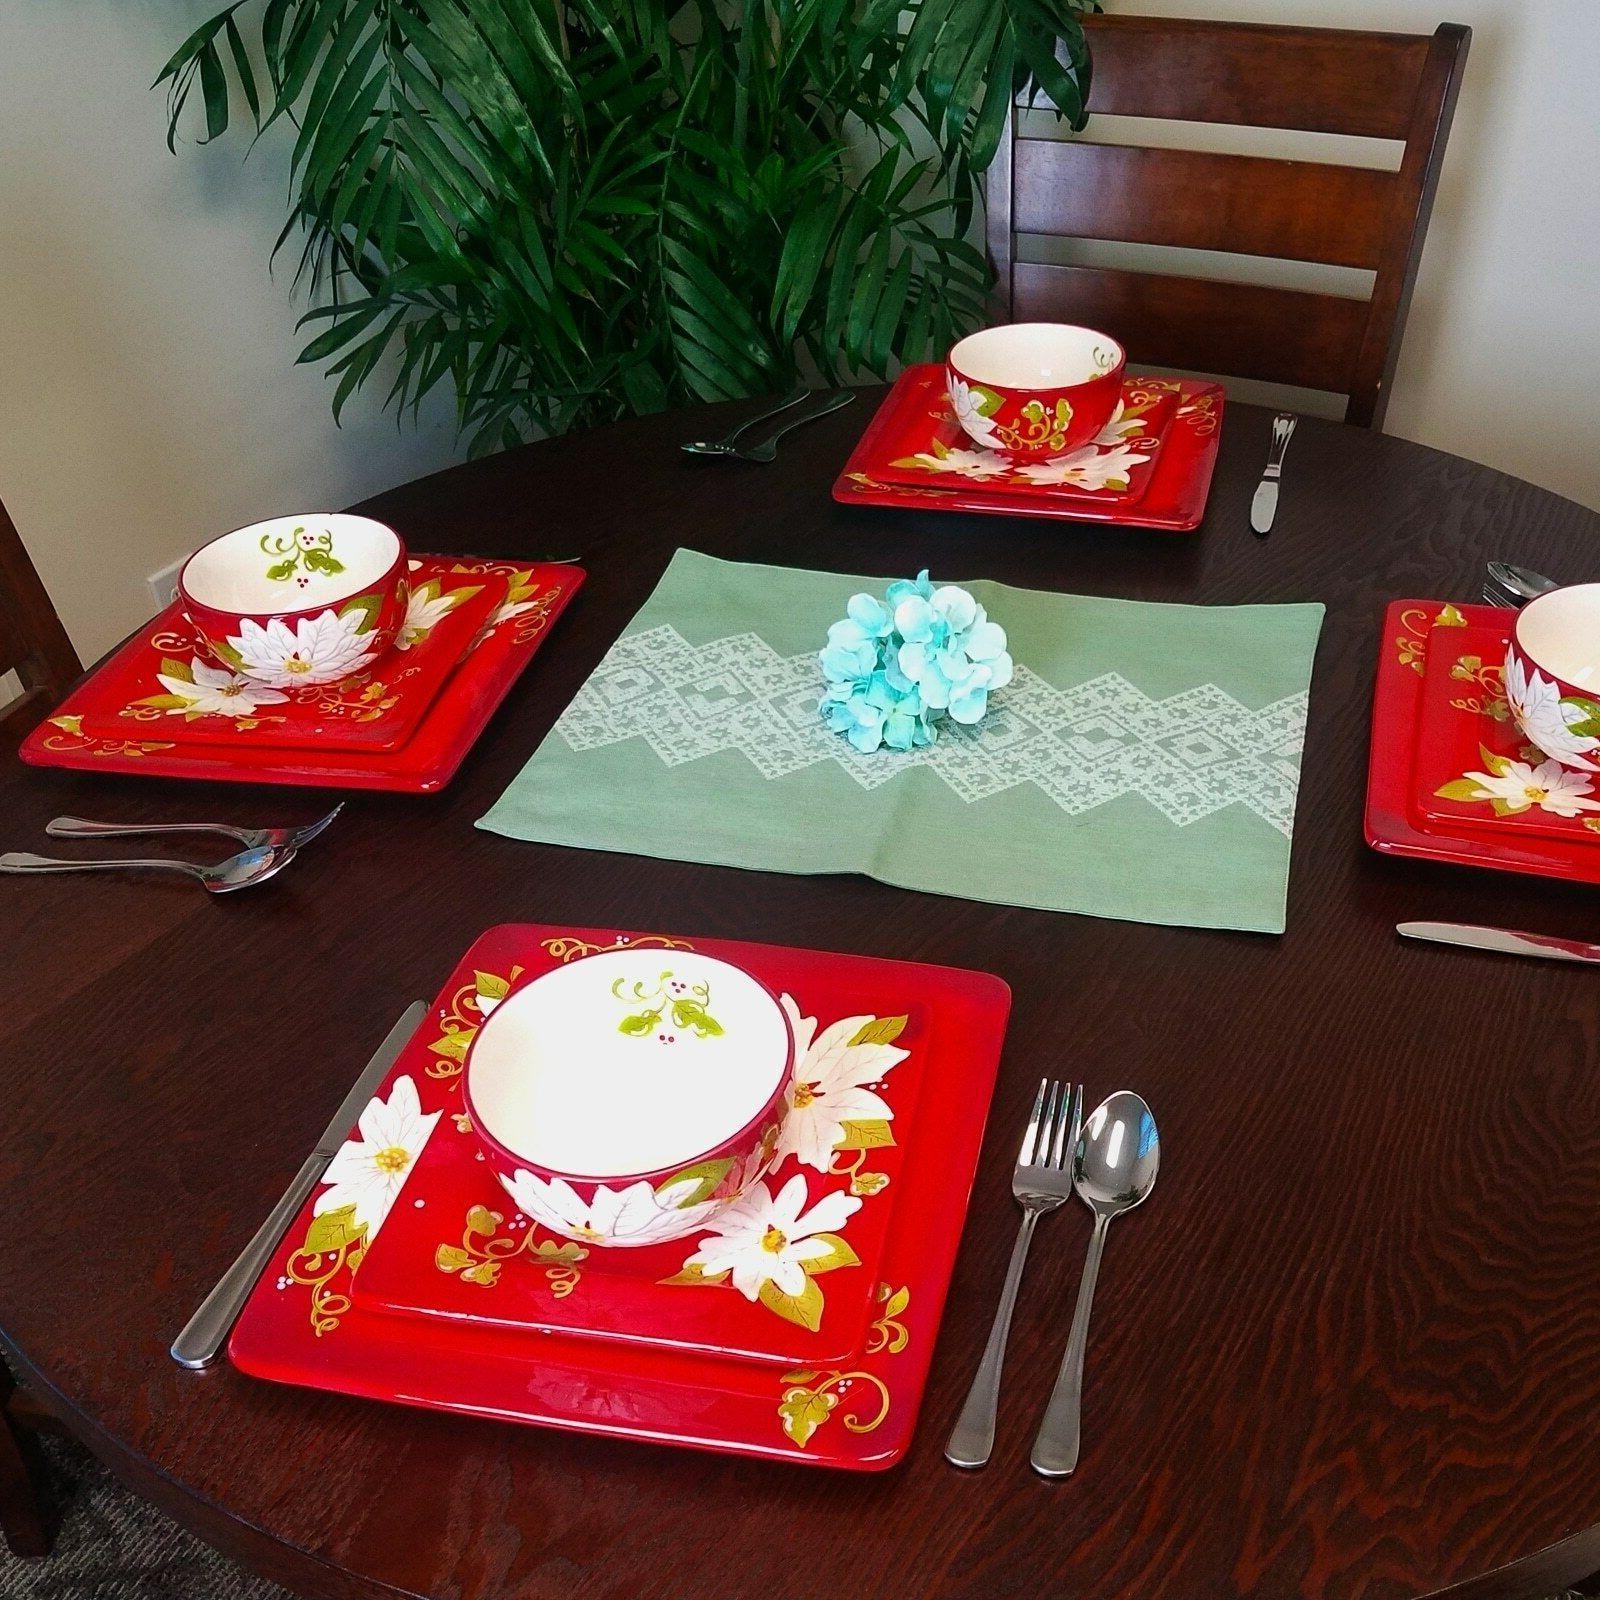 Christmas Dinnerware Service Decorated